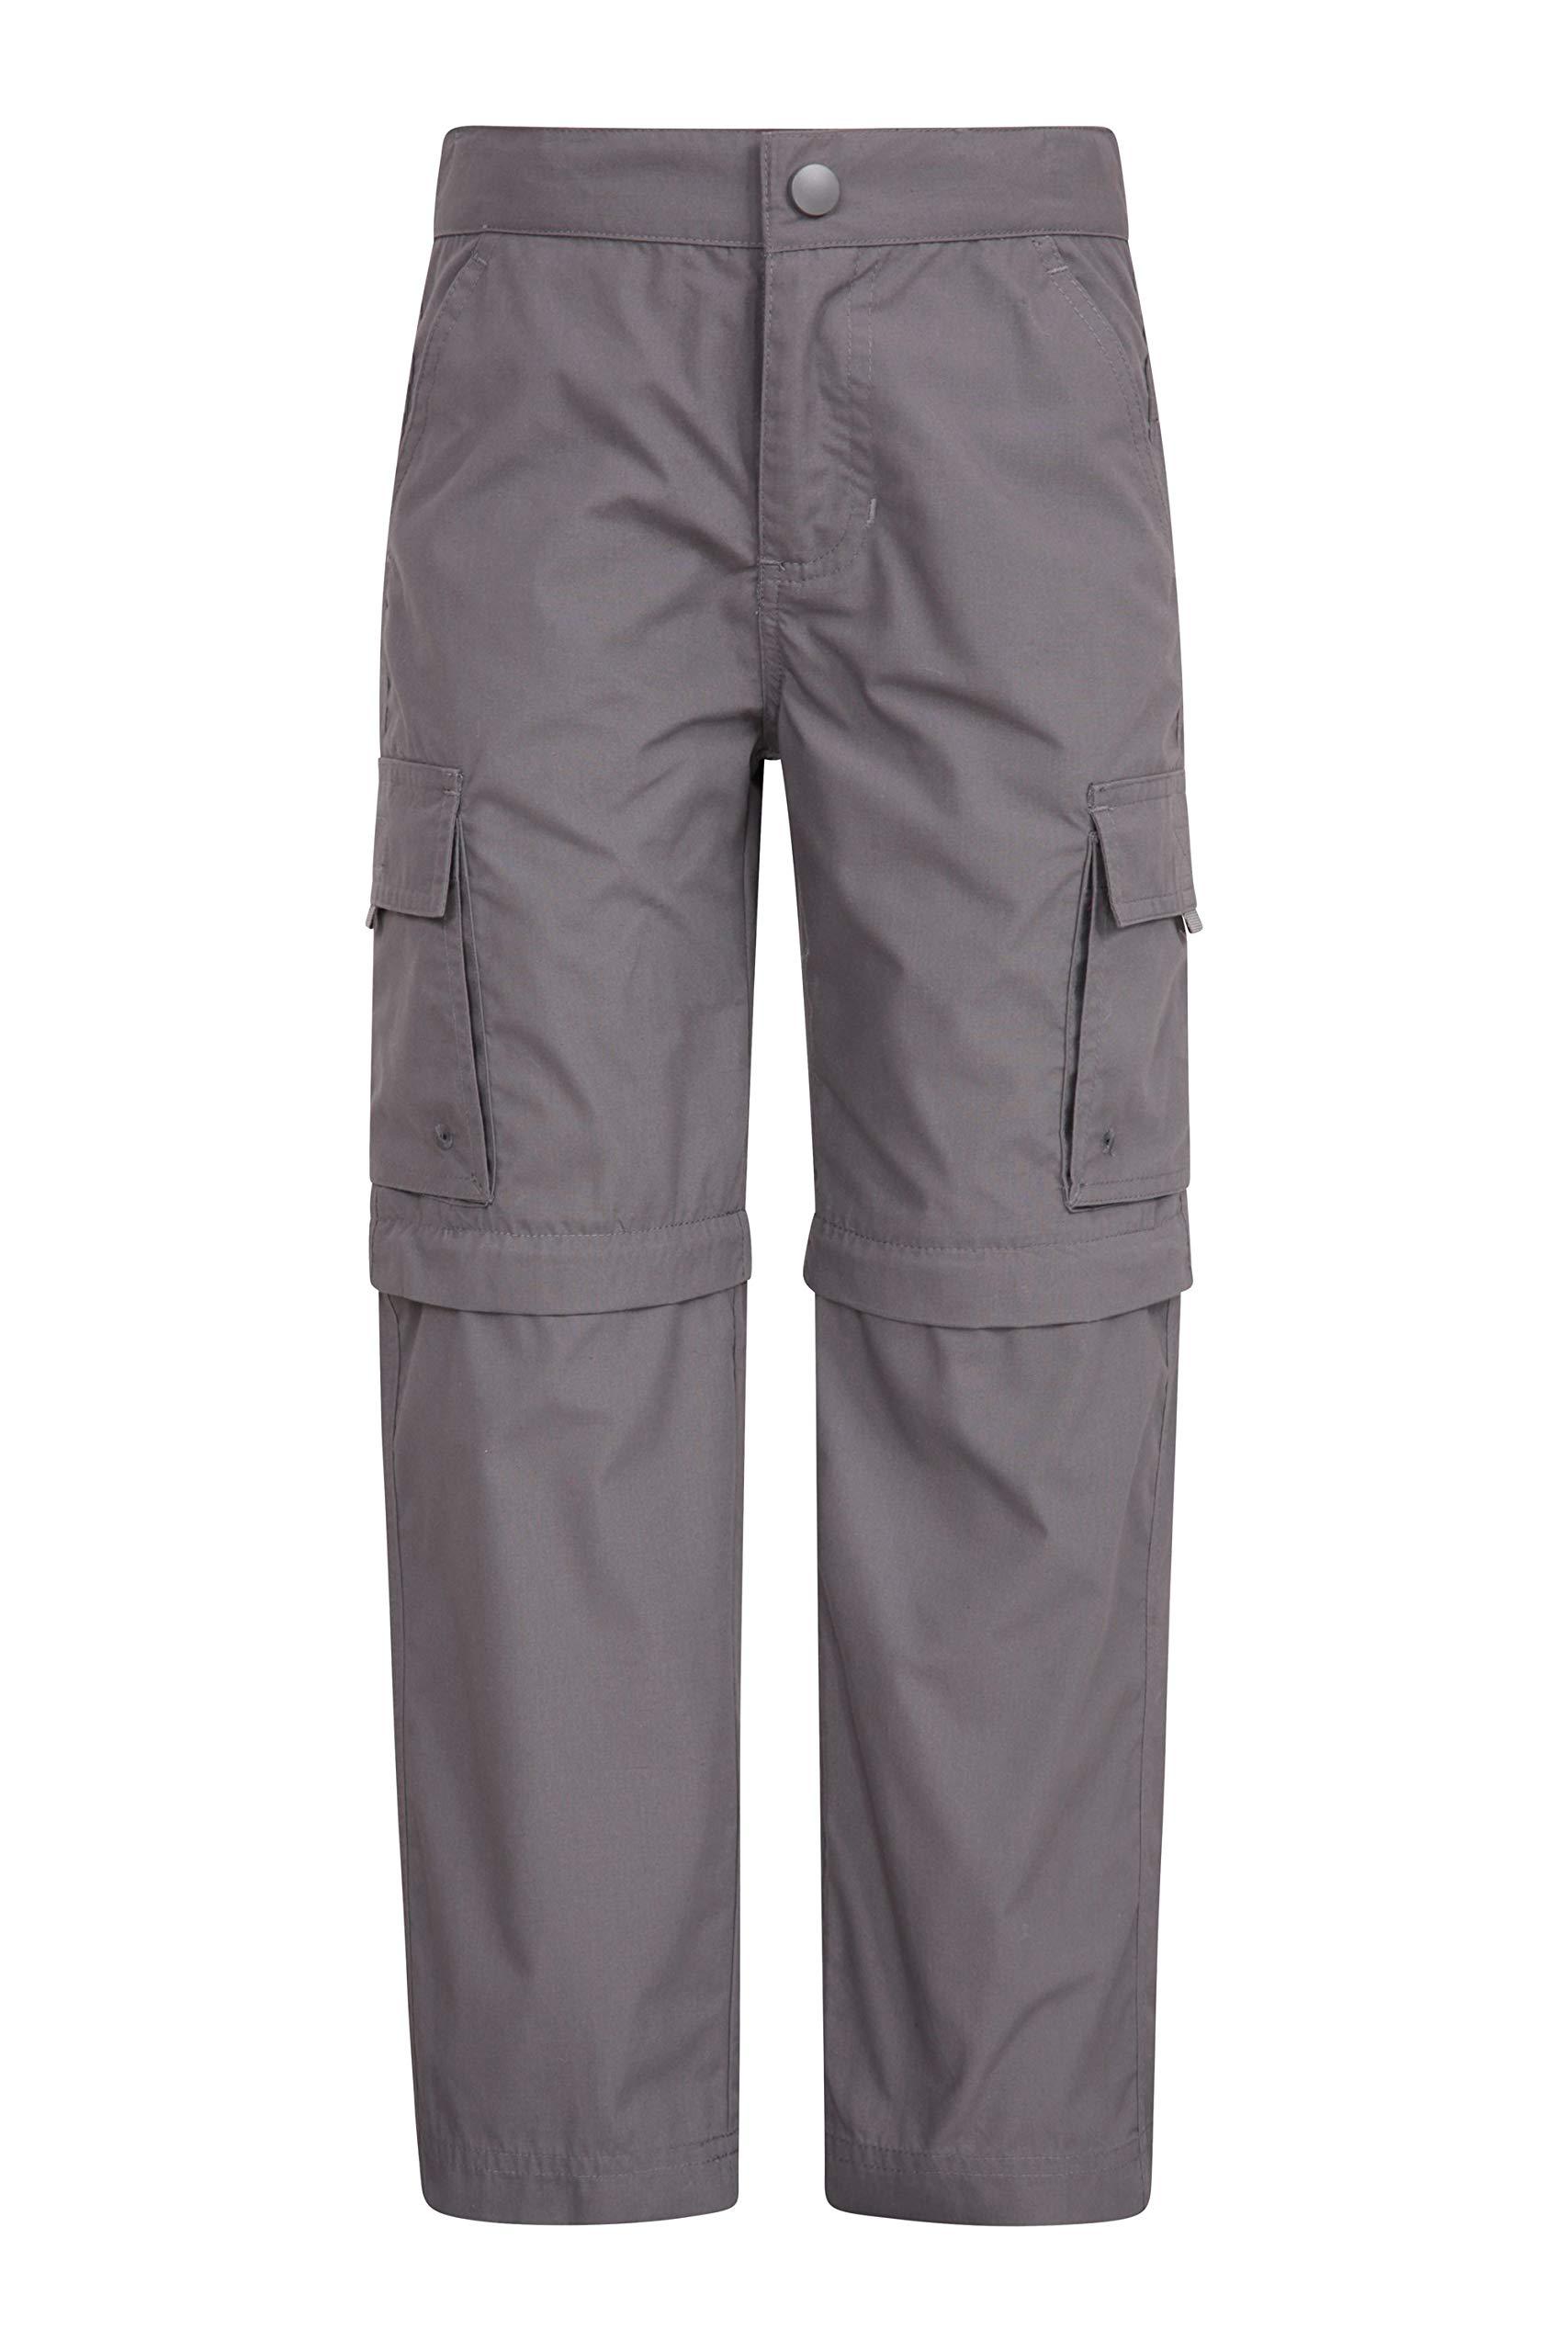 Mountain Warehouse Active Kids Convertible Trousers - Hiking Pants Dark Grey 13 Years